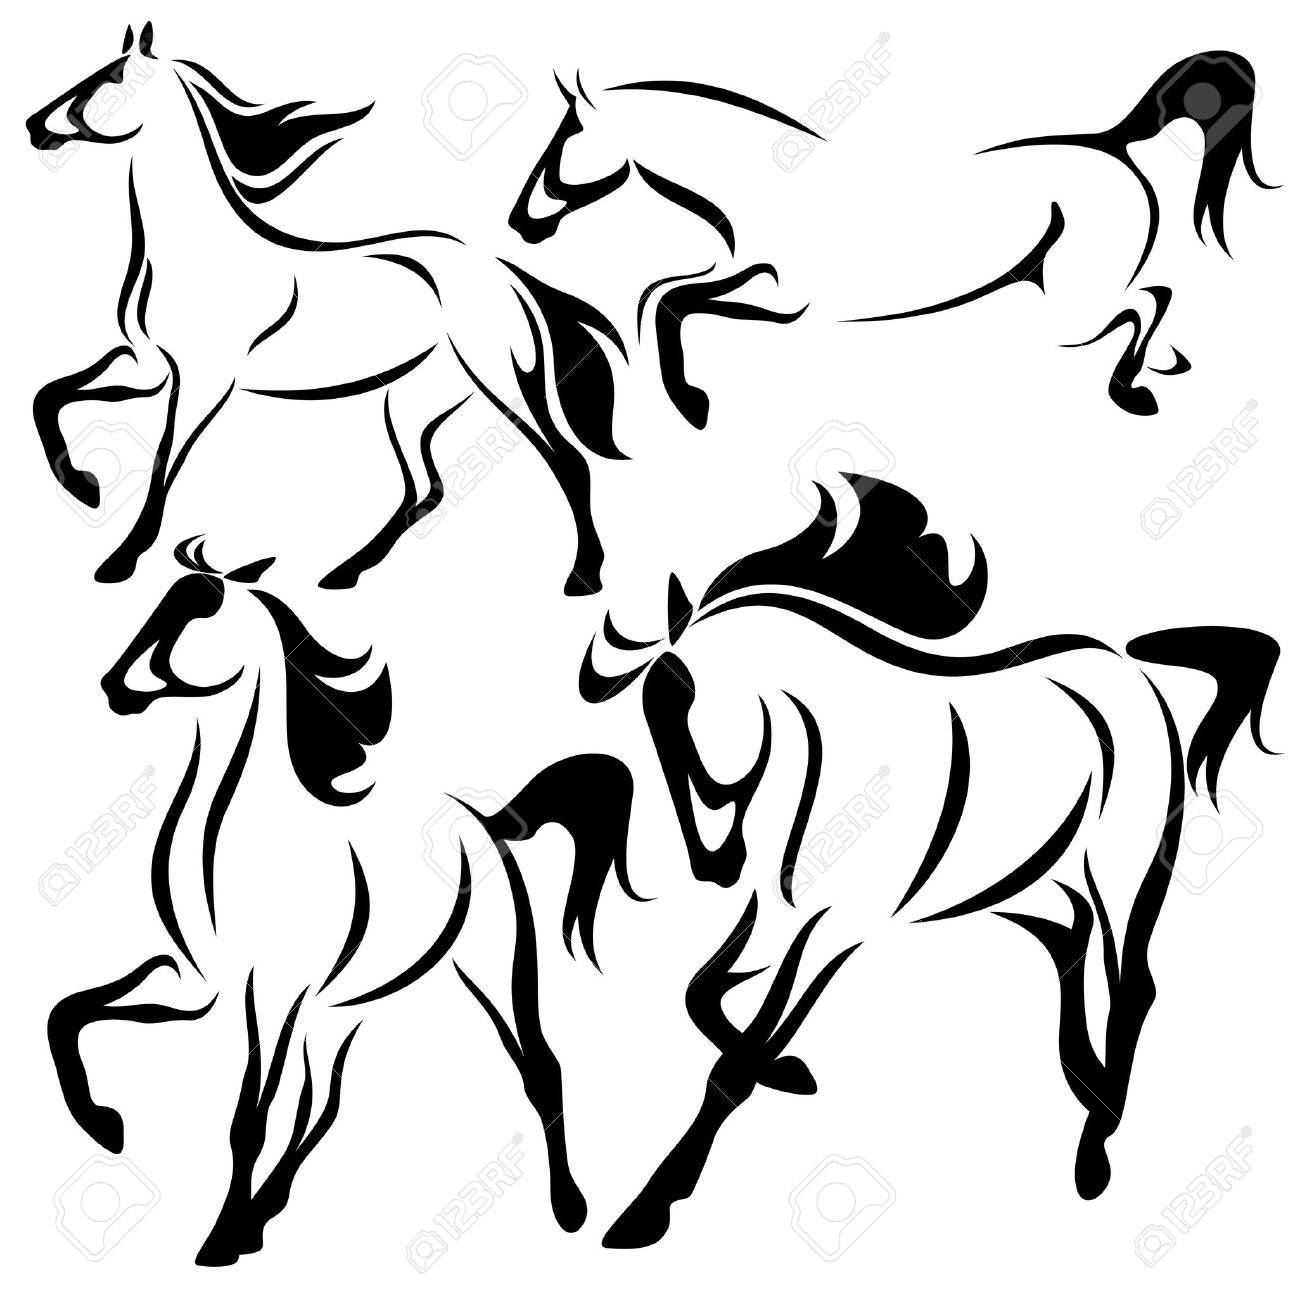 1300x1294 Vector Set Of Fine Horses Outlines Royalty Free Cliparts, Vectors